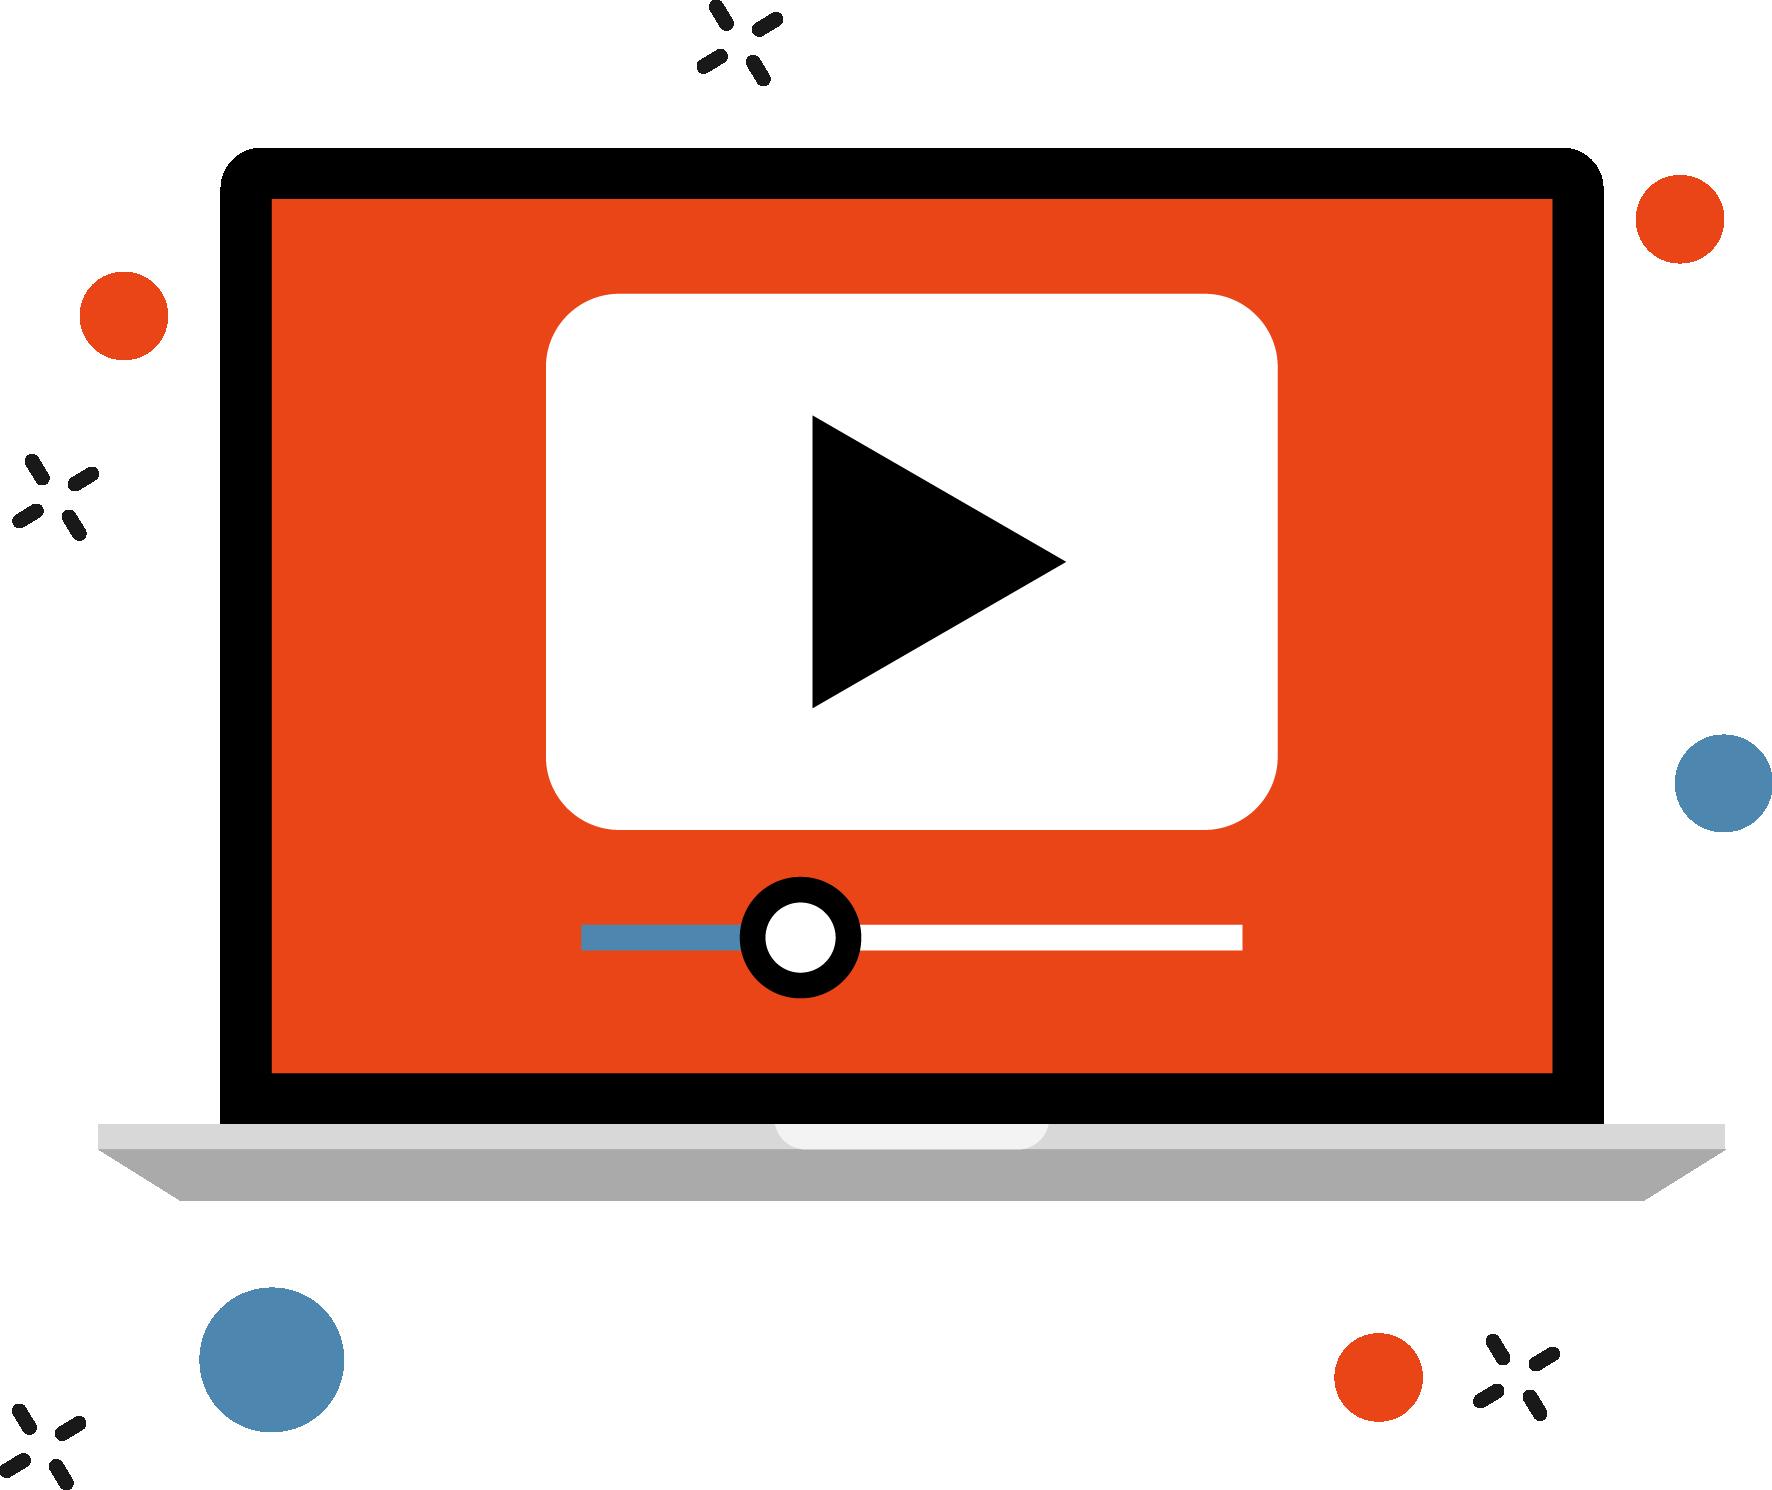 custom logo intro for twitch,  youtube,  esport